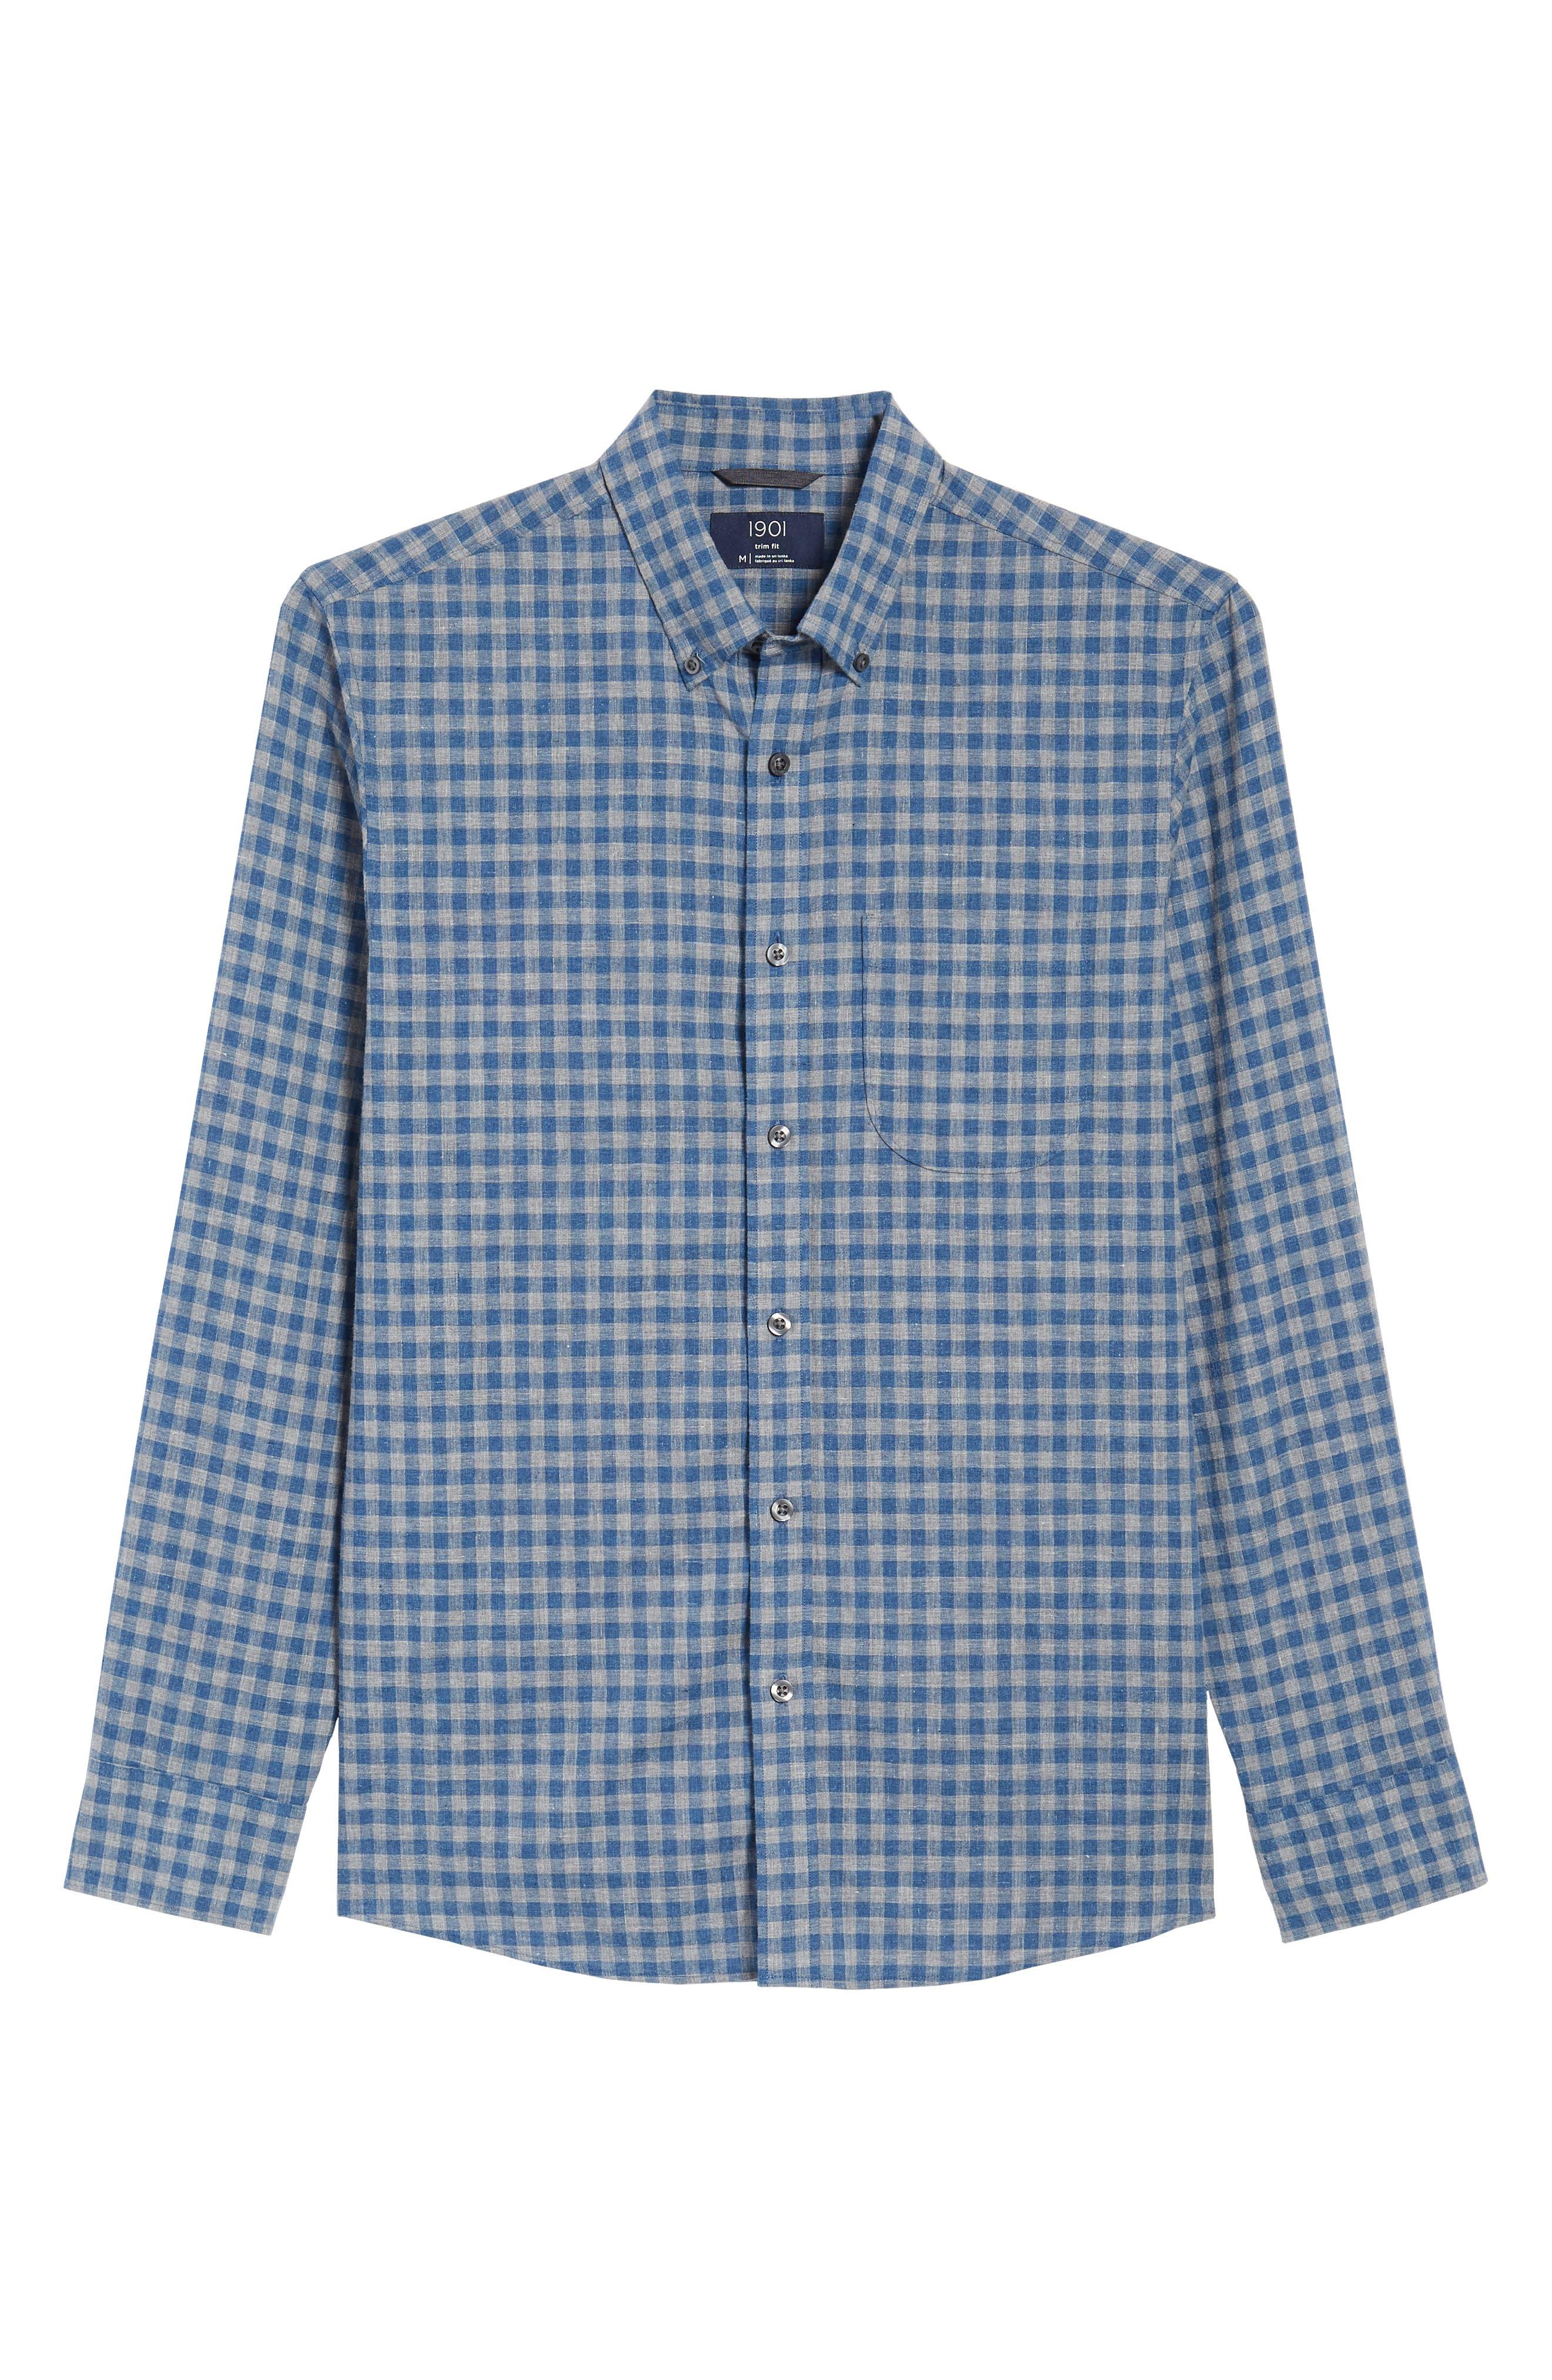 Trim Fit Heather Gingham Linen Blend Sport Shirt,                             Alternate thumbnail 6, color,                             030